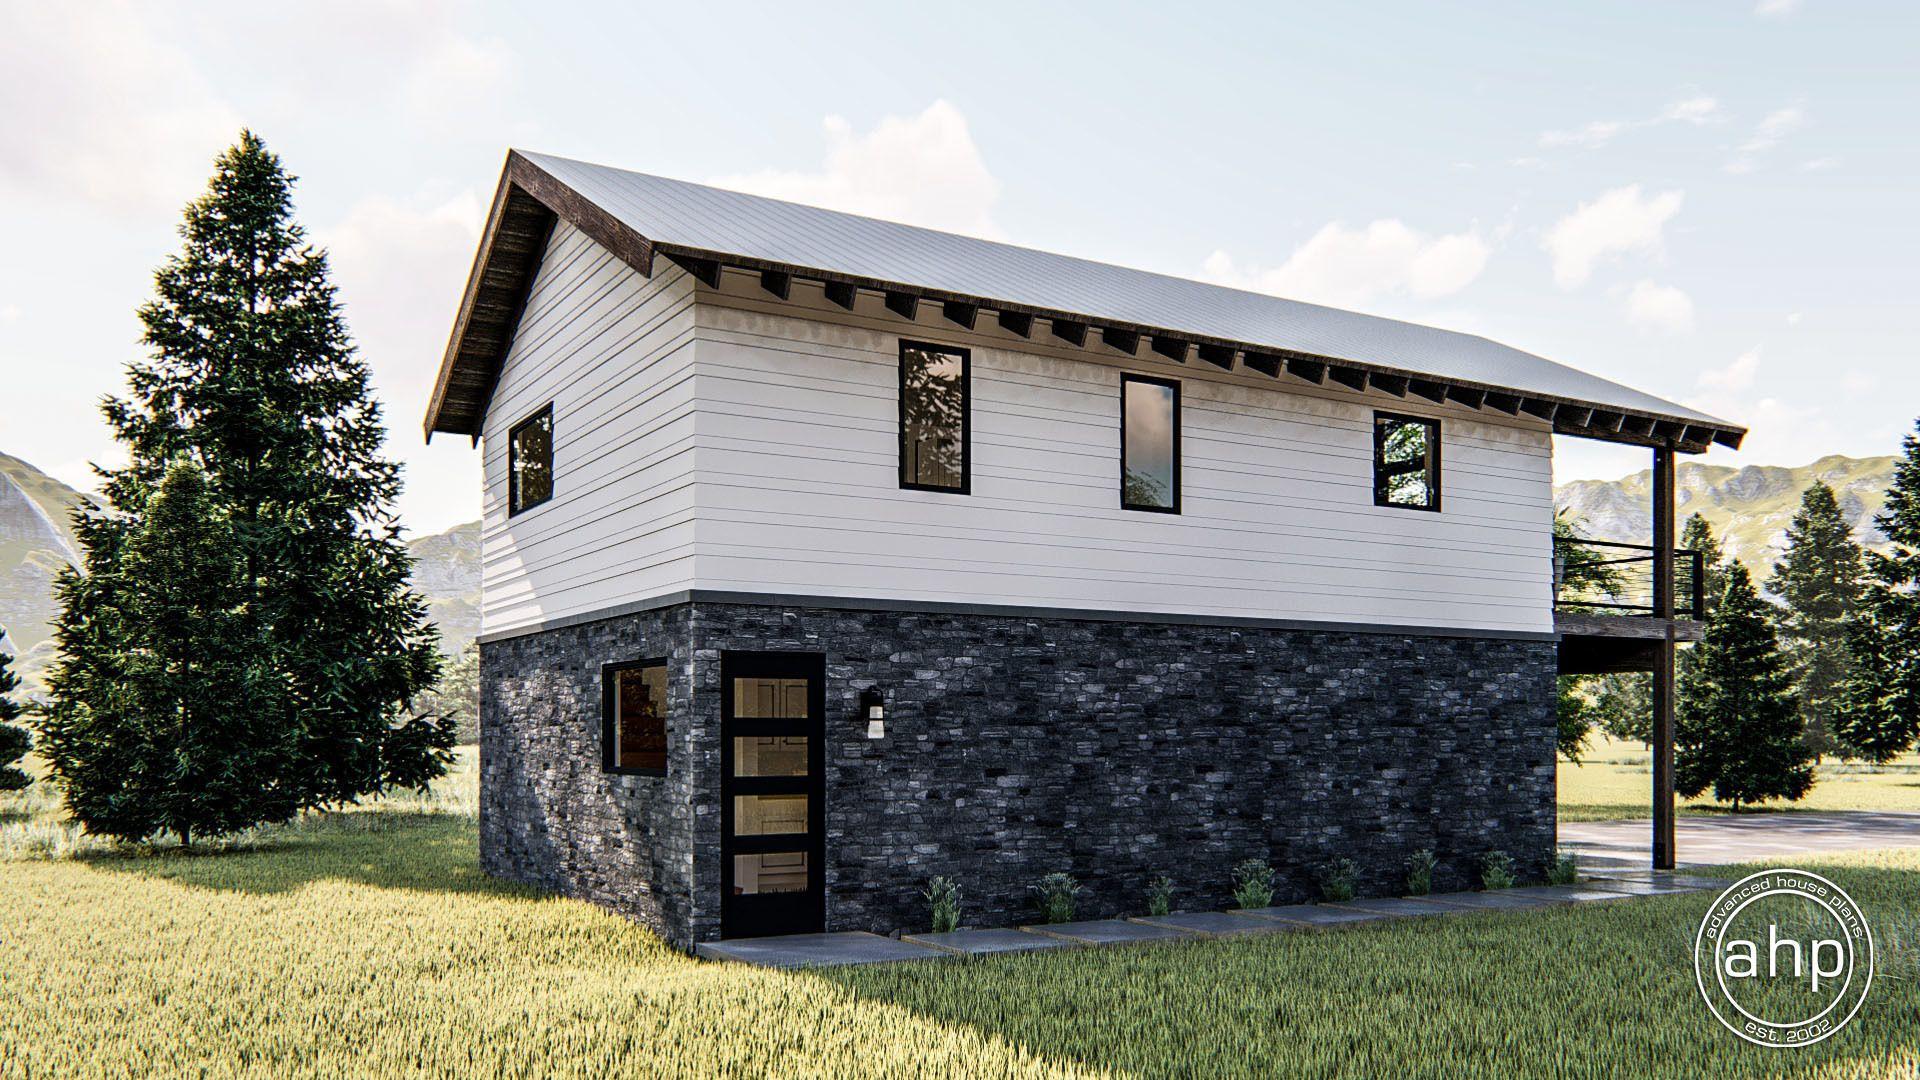 Modern Rustic Style Apartment Garage Arapahoe Garage Door Design Metal Building Homes Lake Houses Exterior